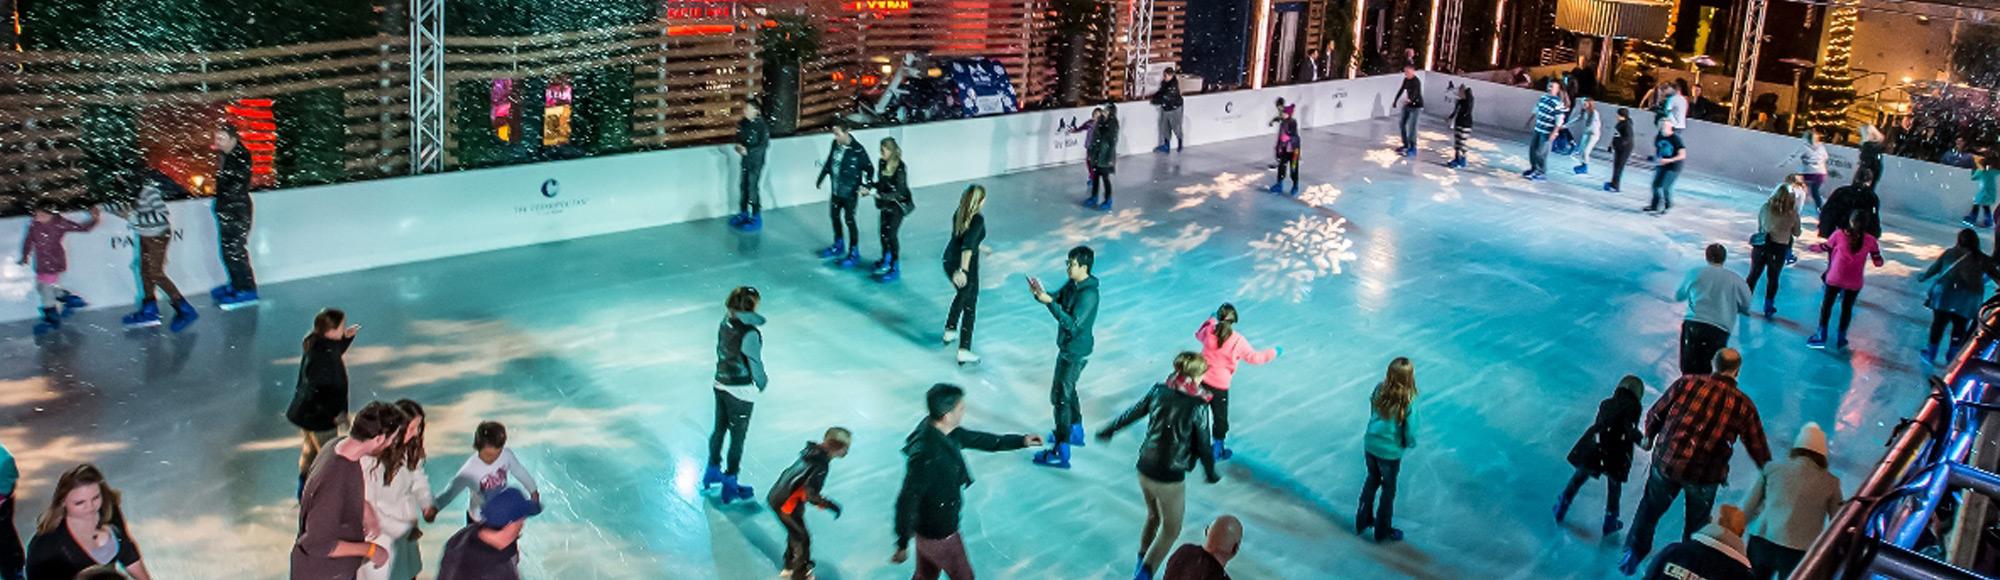 The Ice Rink At Boulevard Pool Vegas Com